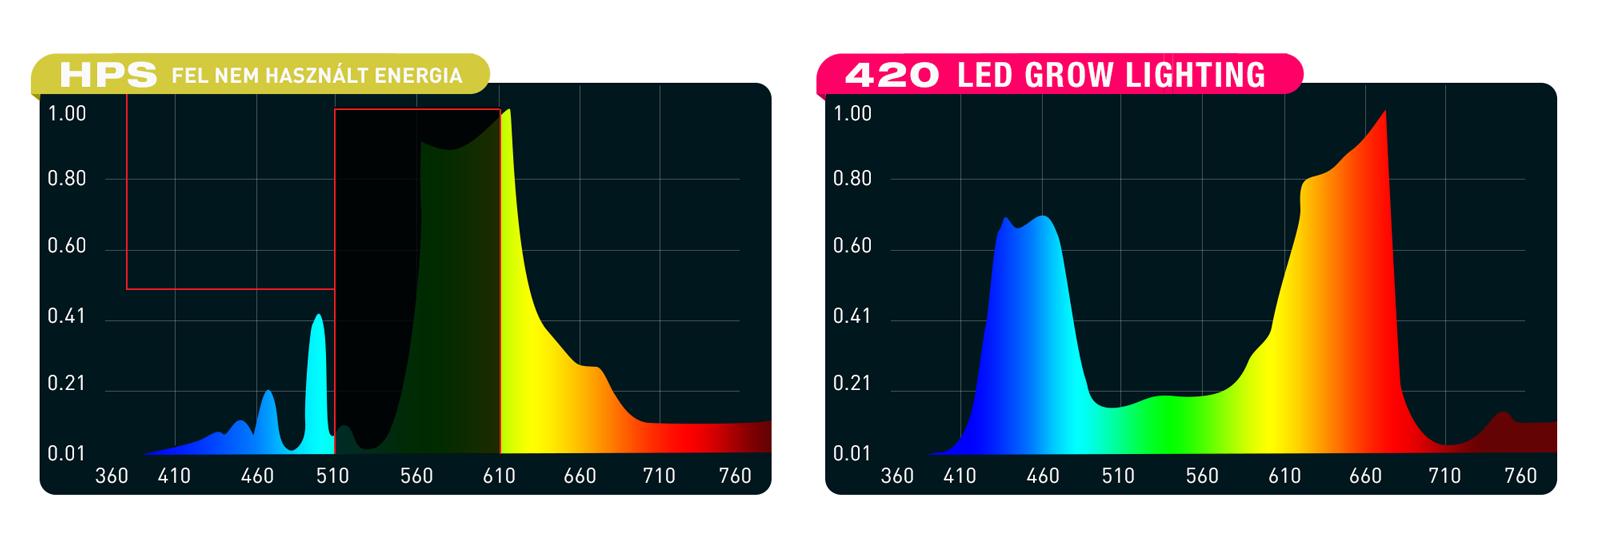 961dff9_led_vs_hps_420ledgrowlighting_1.png